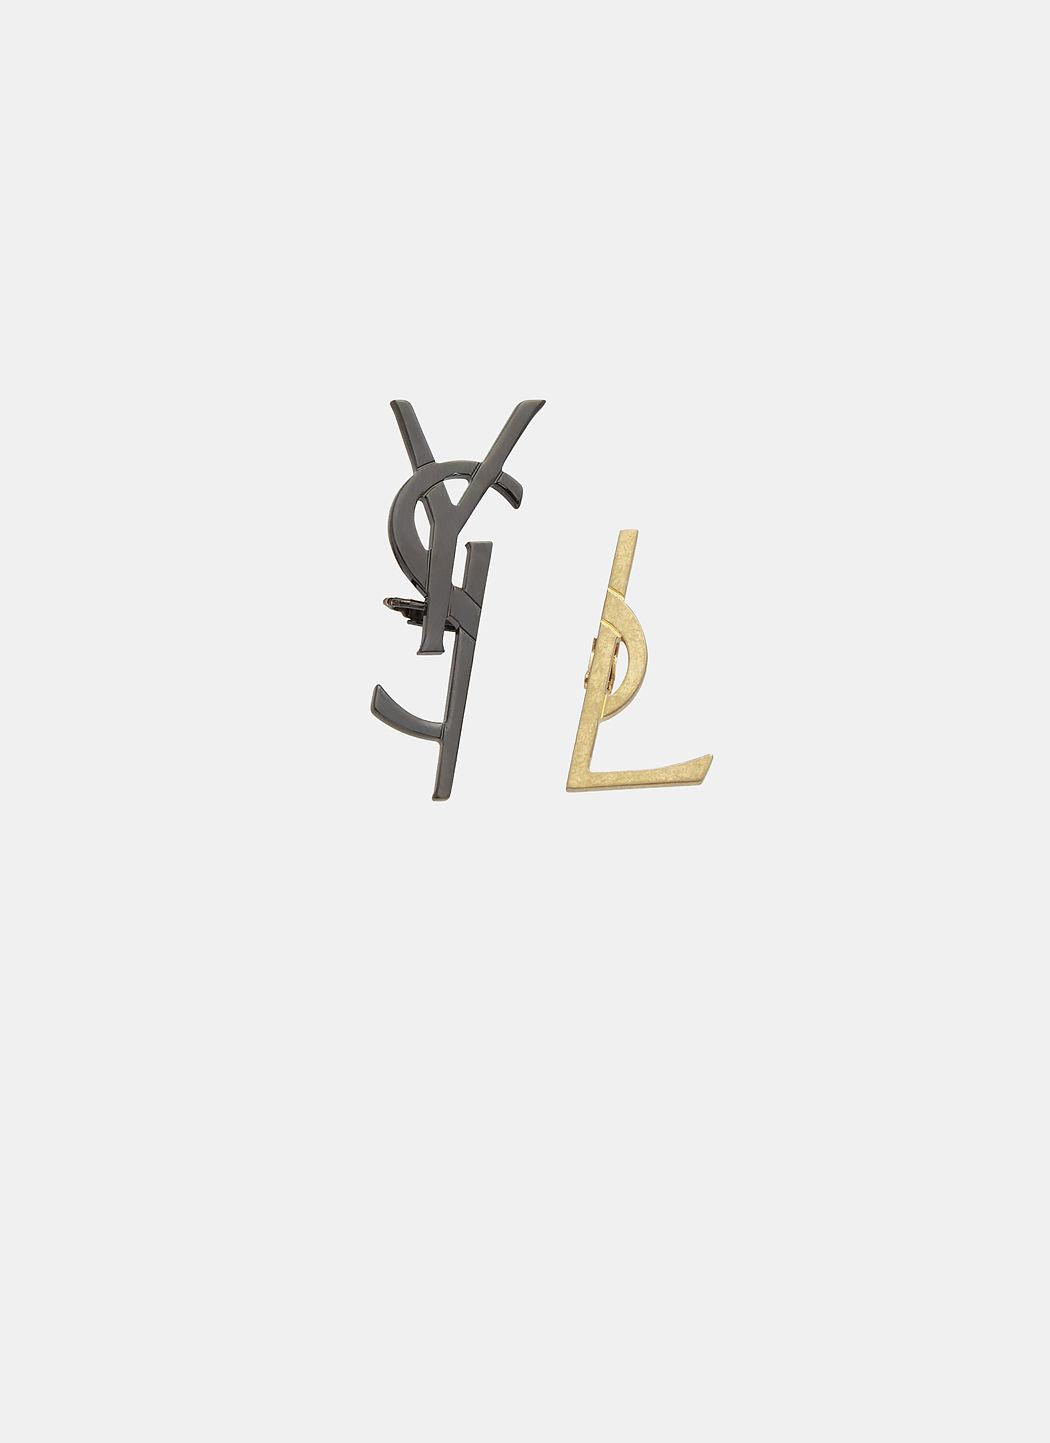 Saint Laurent Deconstructed Monogram Logo Earrings In Black And Gold